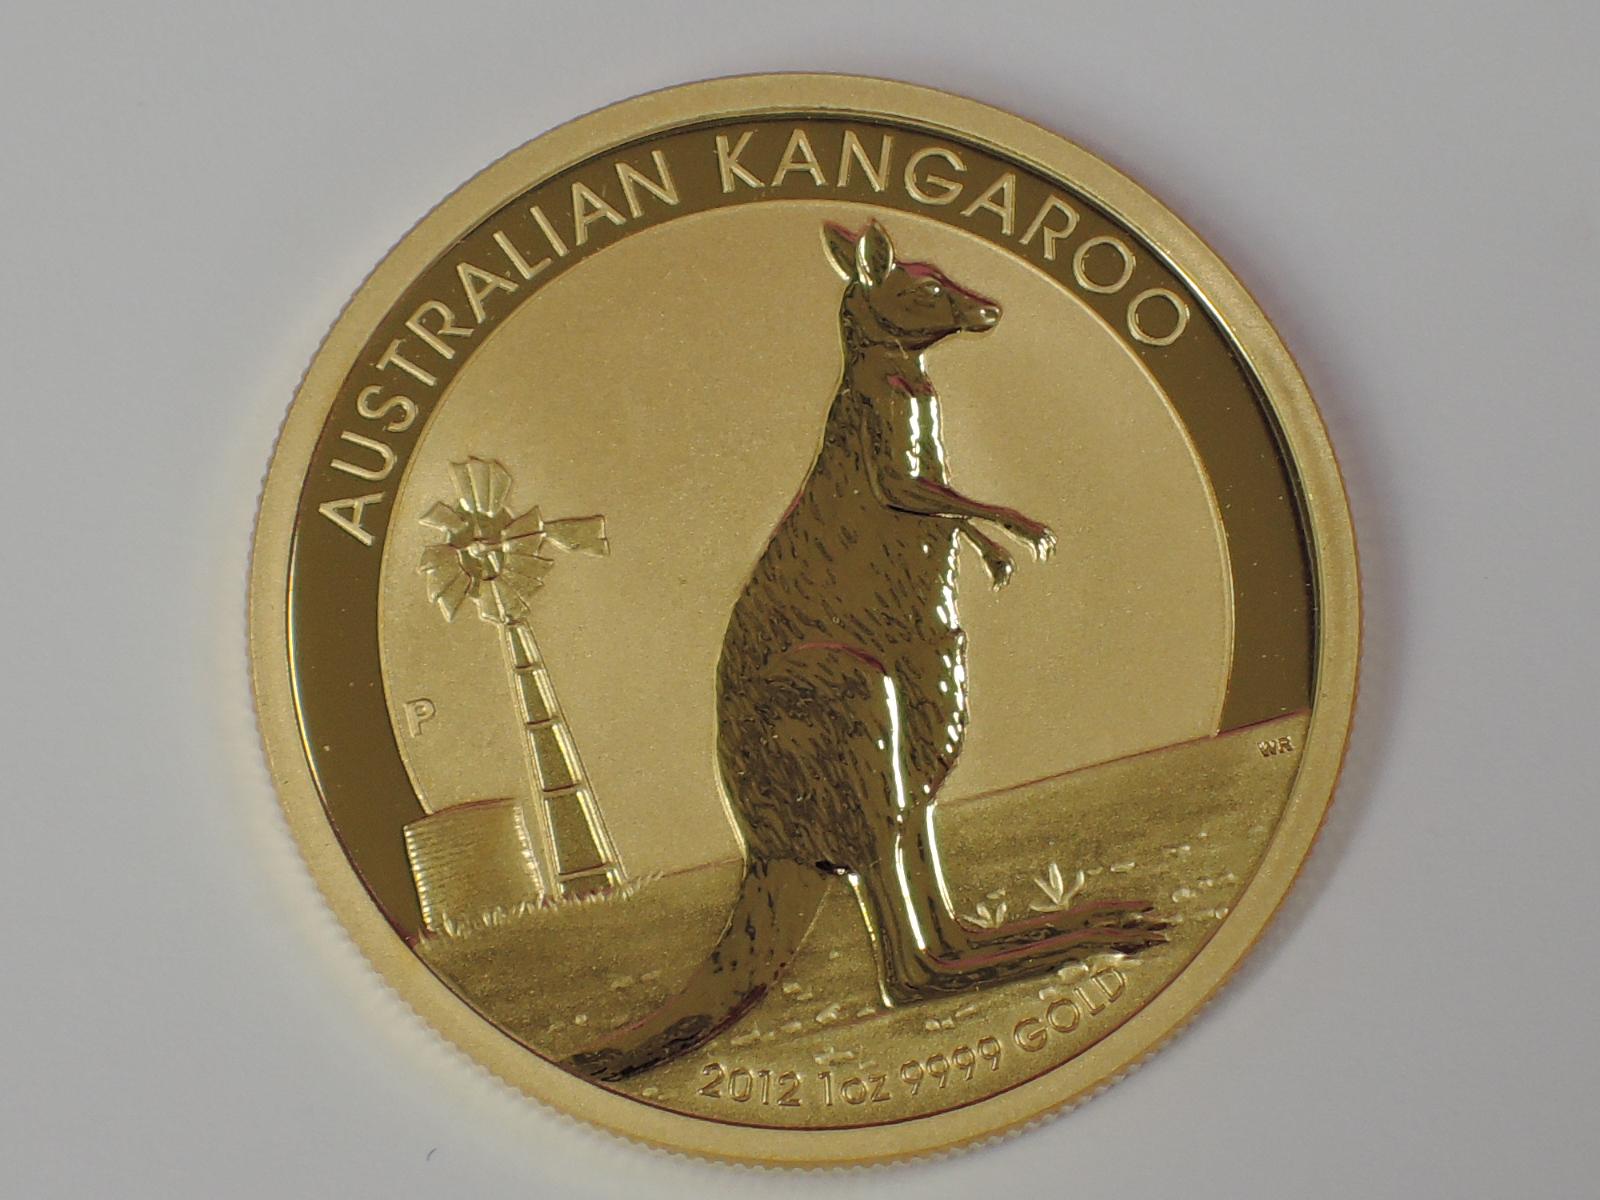 Lot 605 - A gold 1oz 2012 100 dollar Australian Kangaroo coin, in plastic case